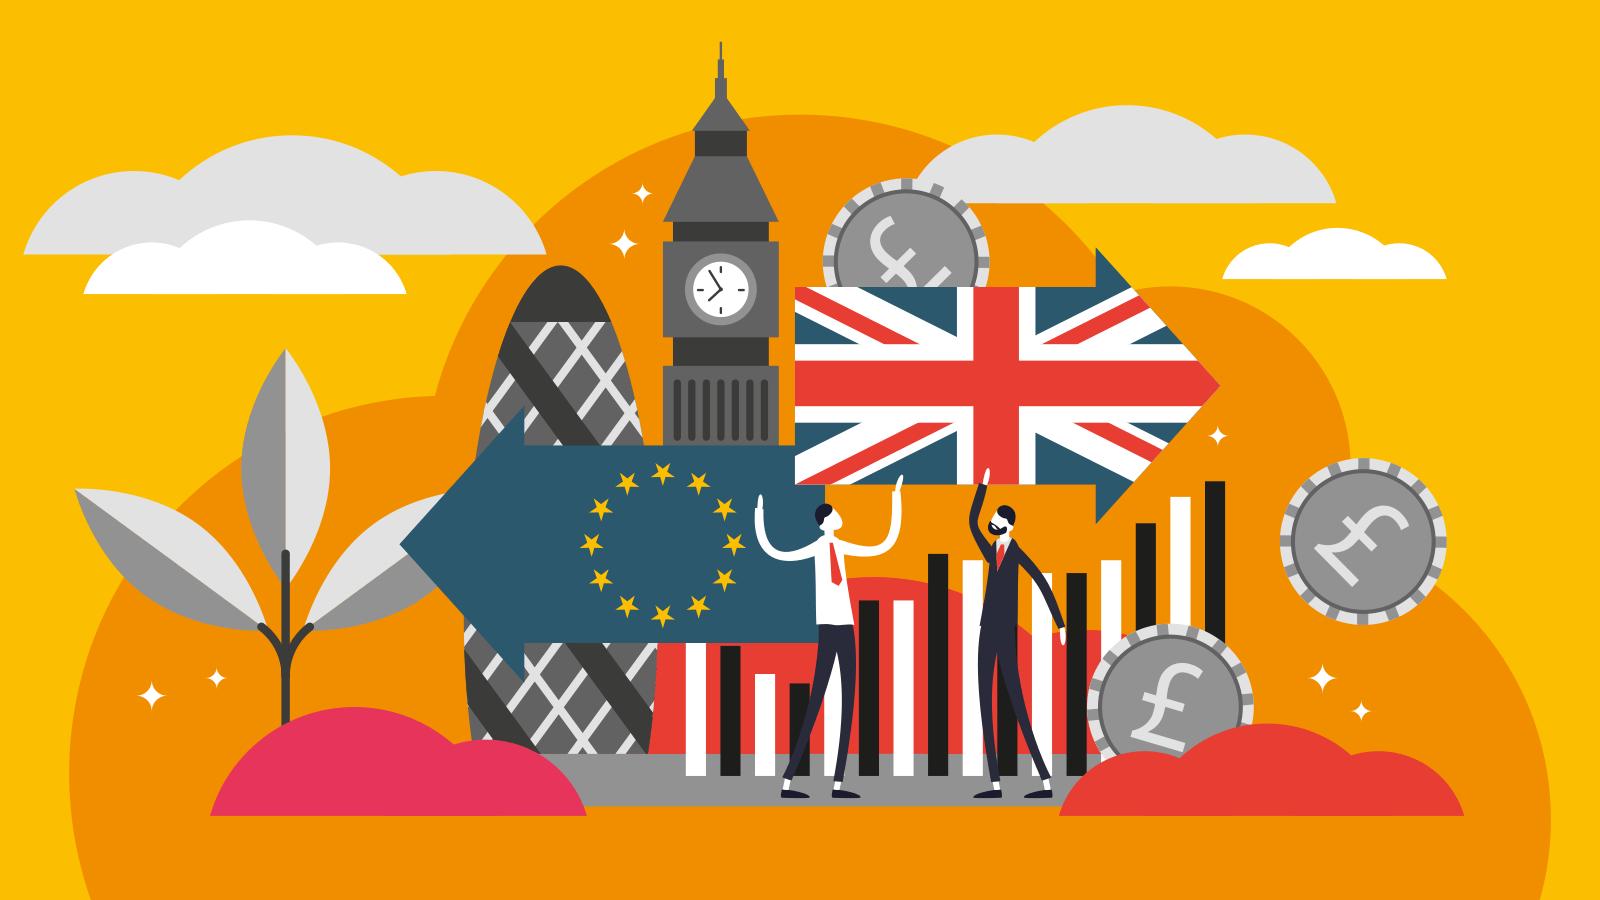 brexit-illustrasjon-1